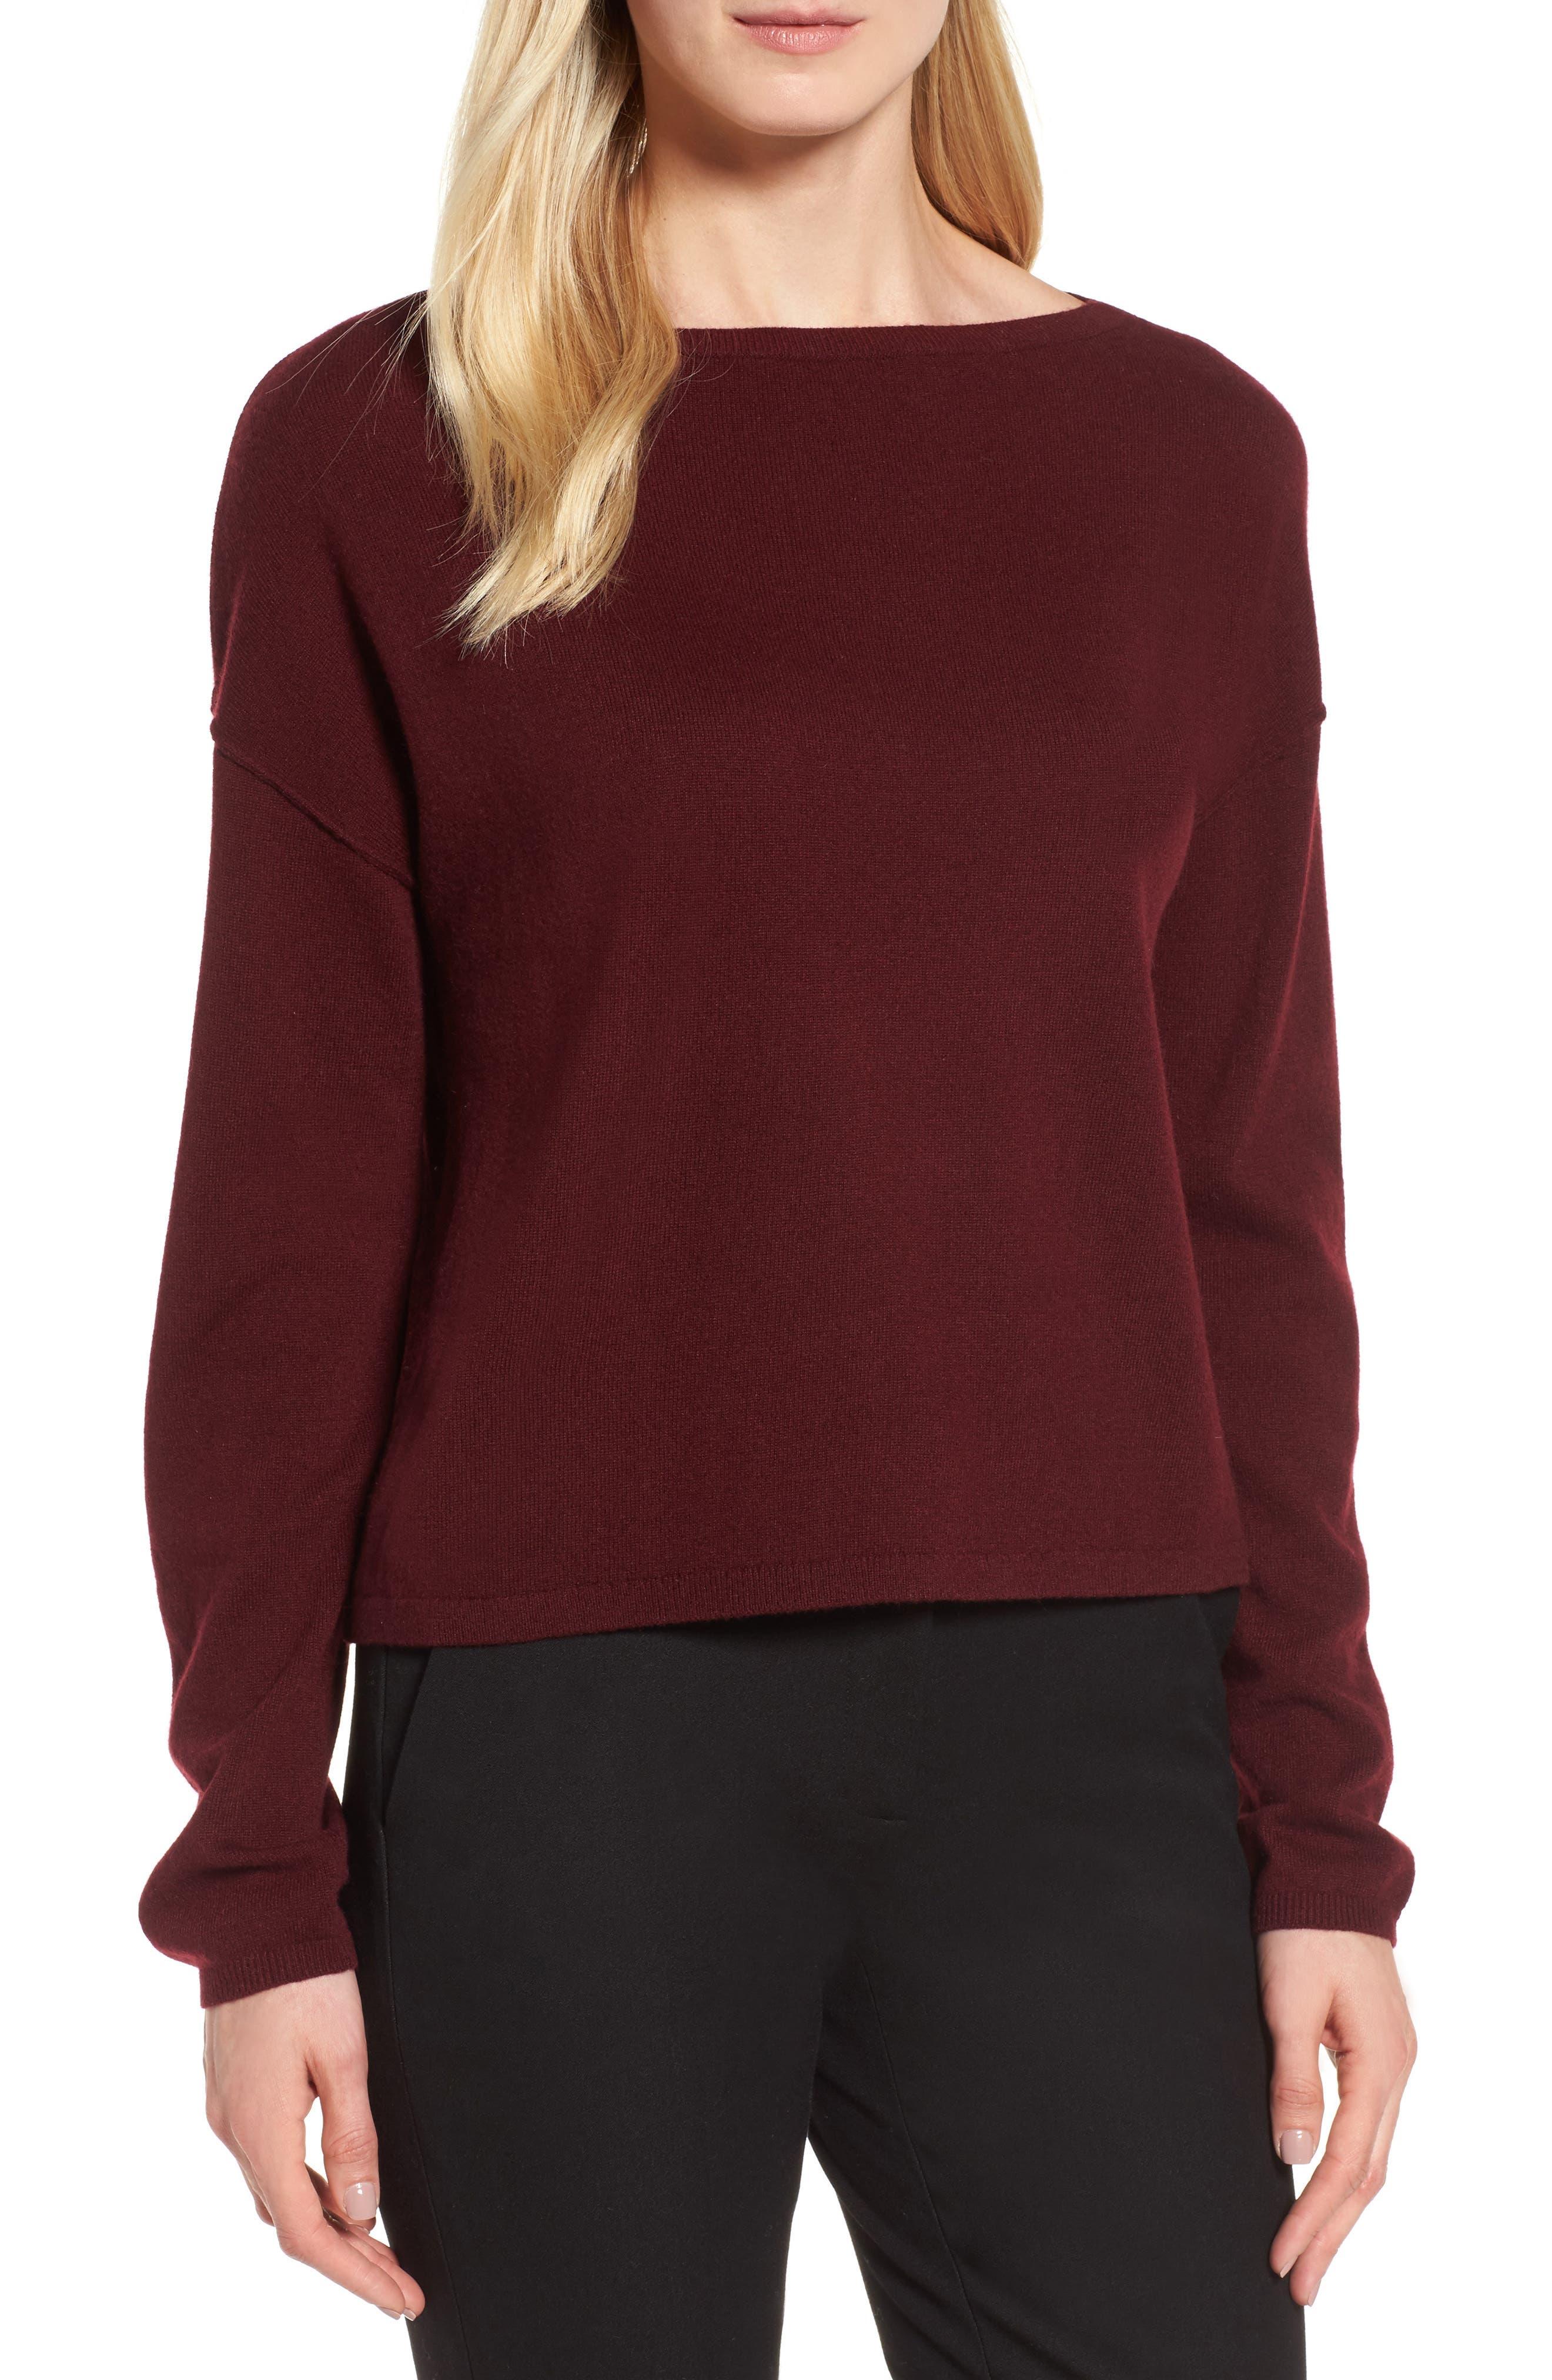 Alternate Image 1 Selected - Nordstrom Signature Bateau Neck Cashmere Sweater